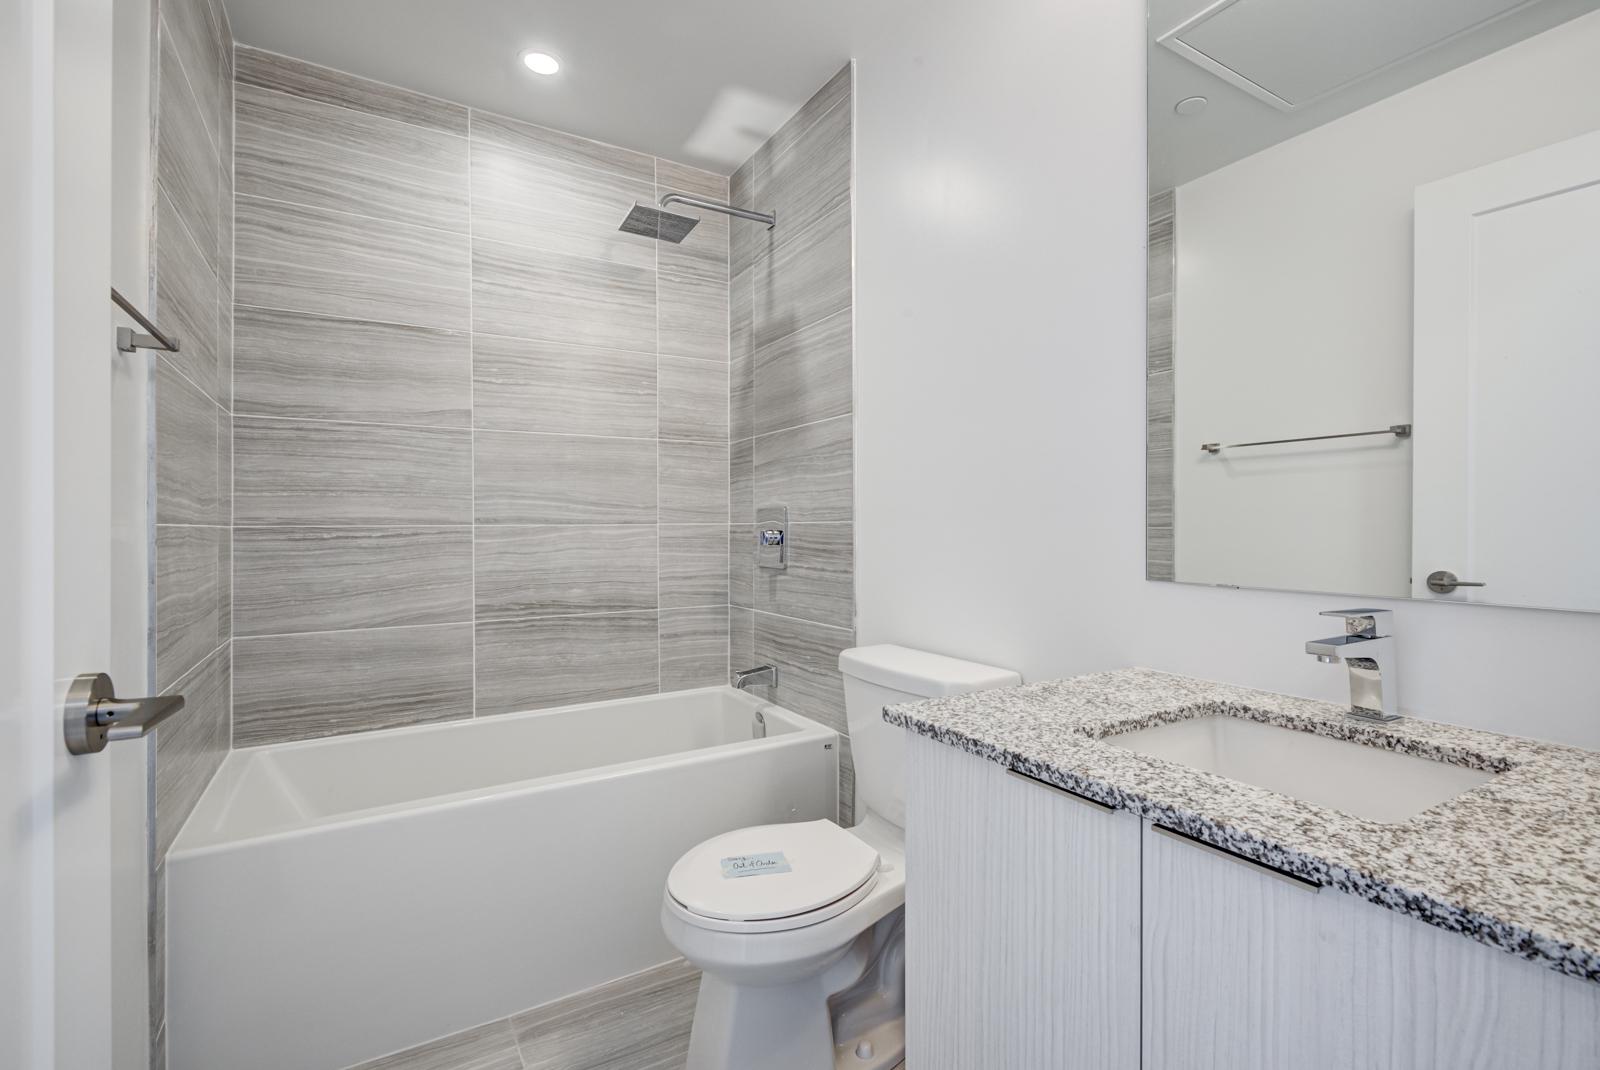 120 Parliament St Unit 1610 bathroom with dark tiles, gray walls and soaker tub.